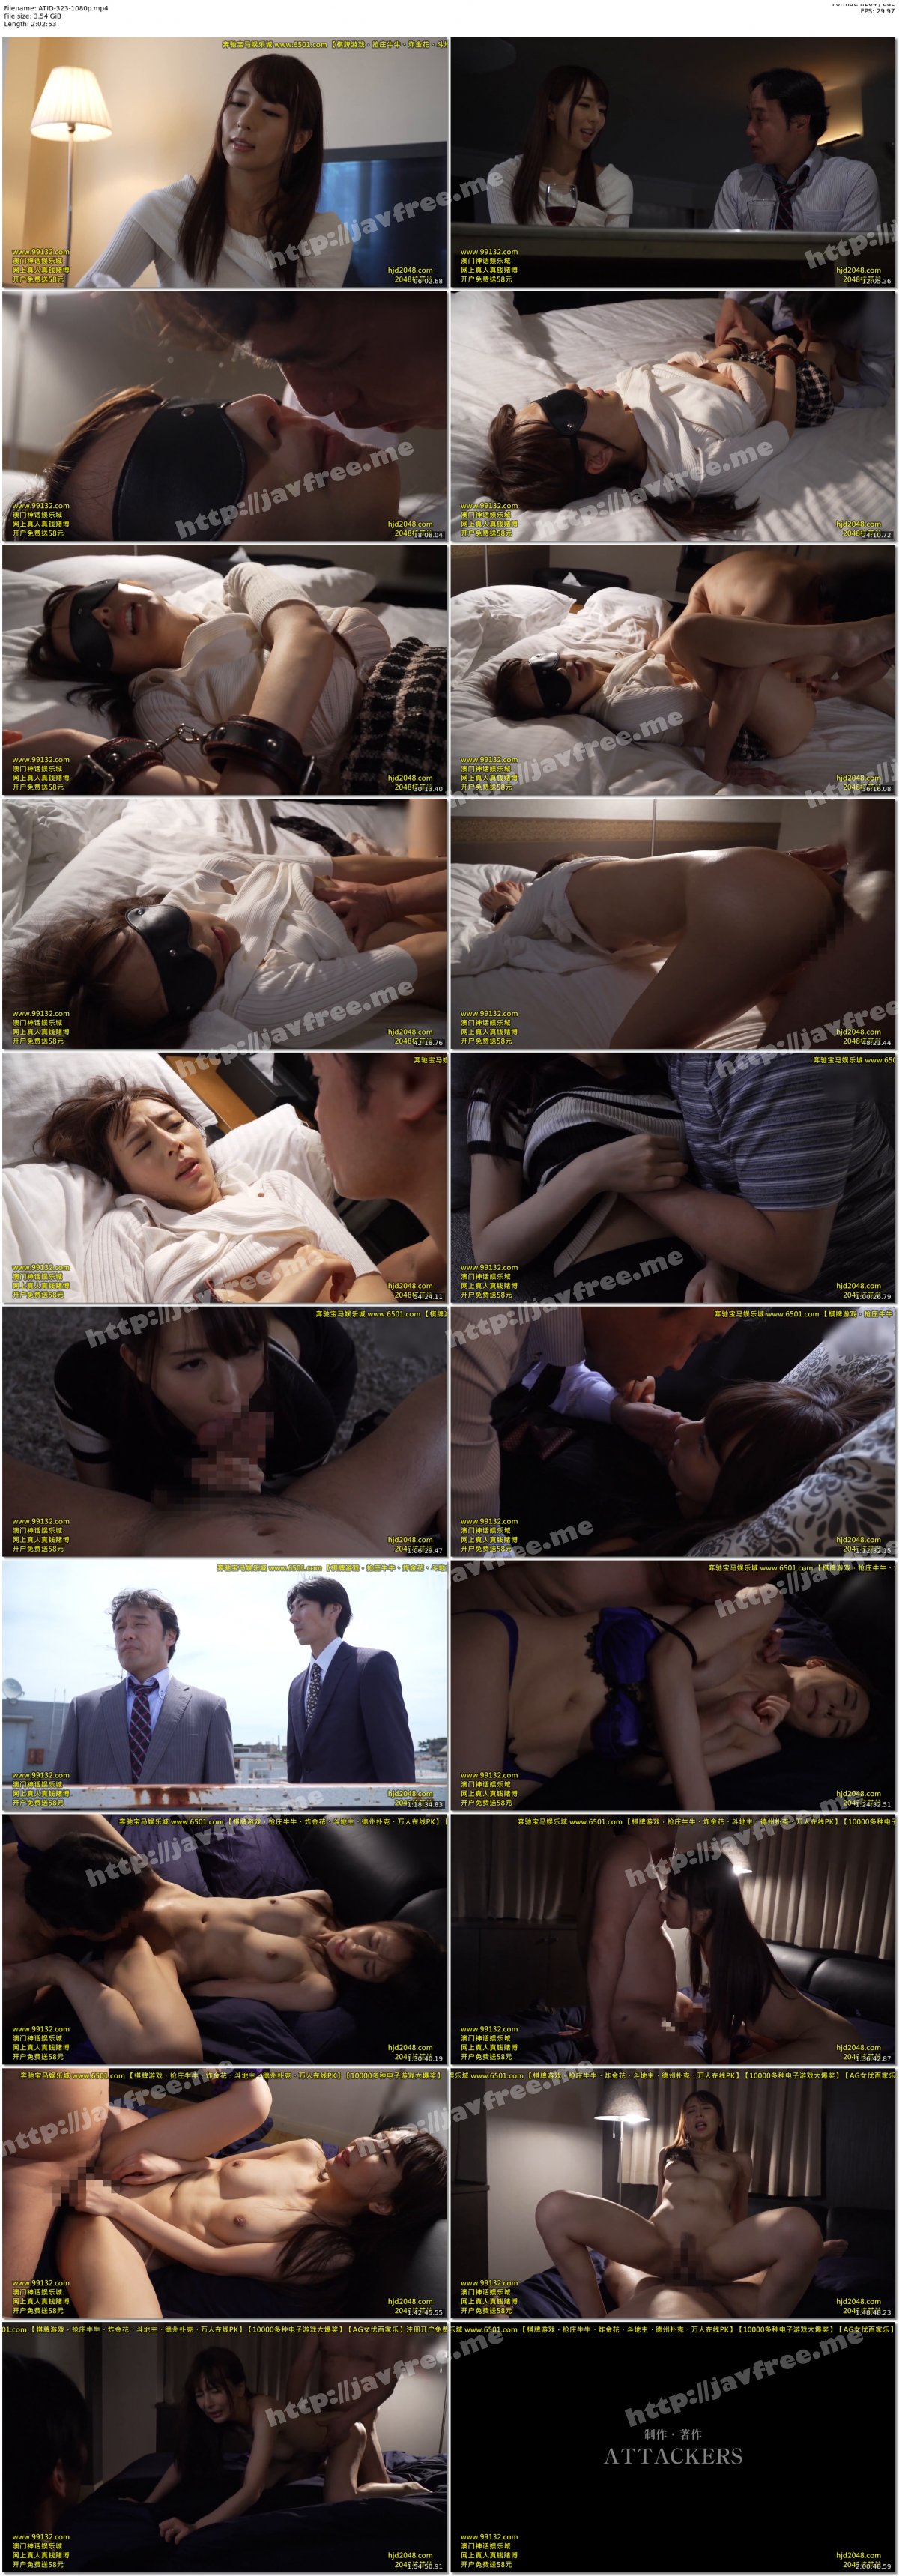 [HD][ATID-323] 僕の妻を寝取ってくれませんか 妻には言えない夫の寝取られ願望 希崎ジェシカ - image ATID-323-1080p on https://javfree.me